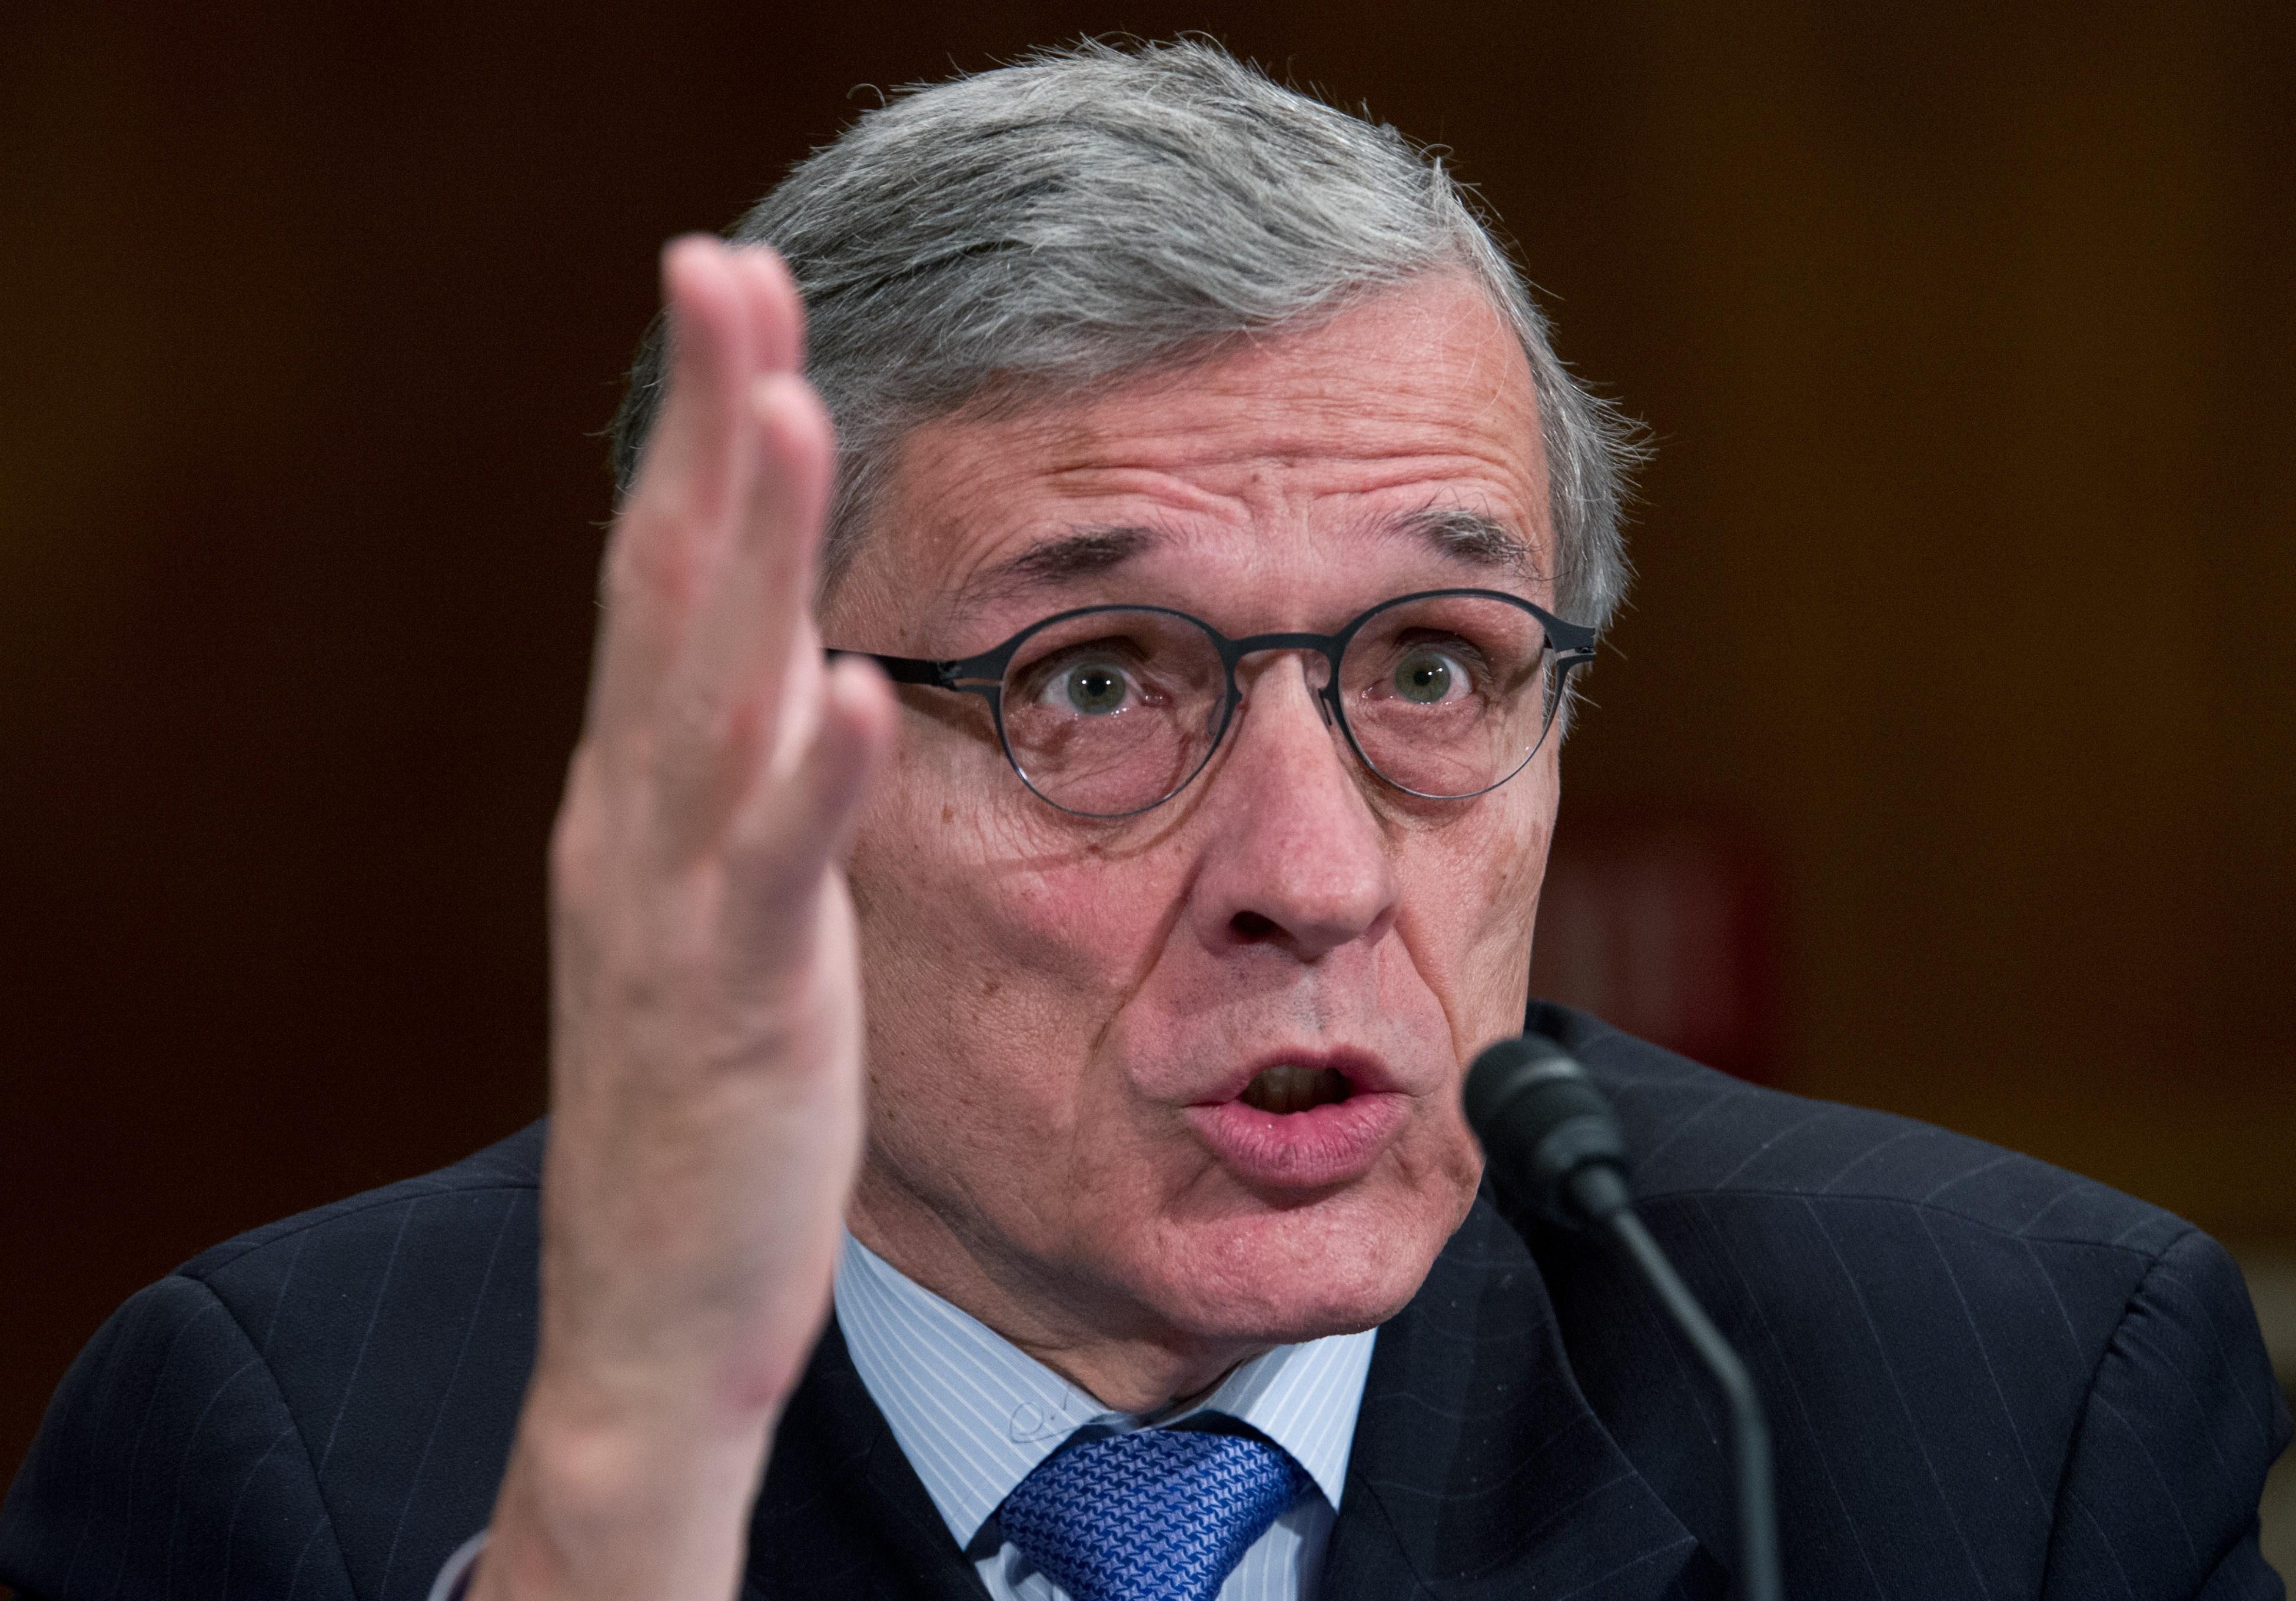 Photo of FCC Chairman Tom Wheeler by KAREN BLEIER/AFP/Getty Images